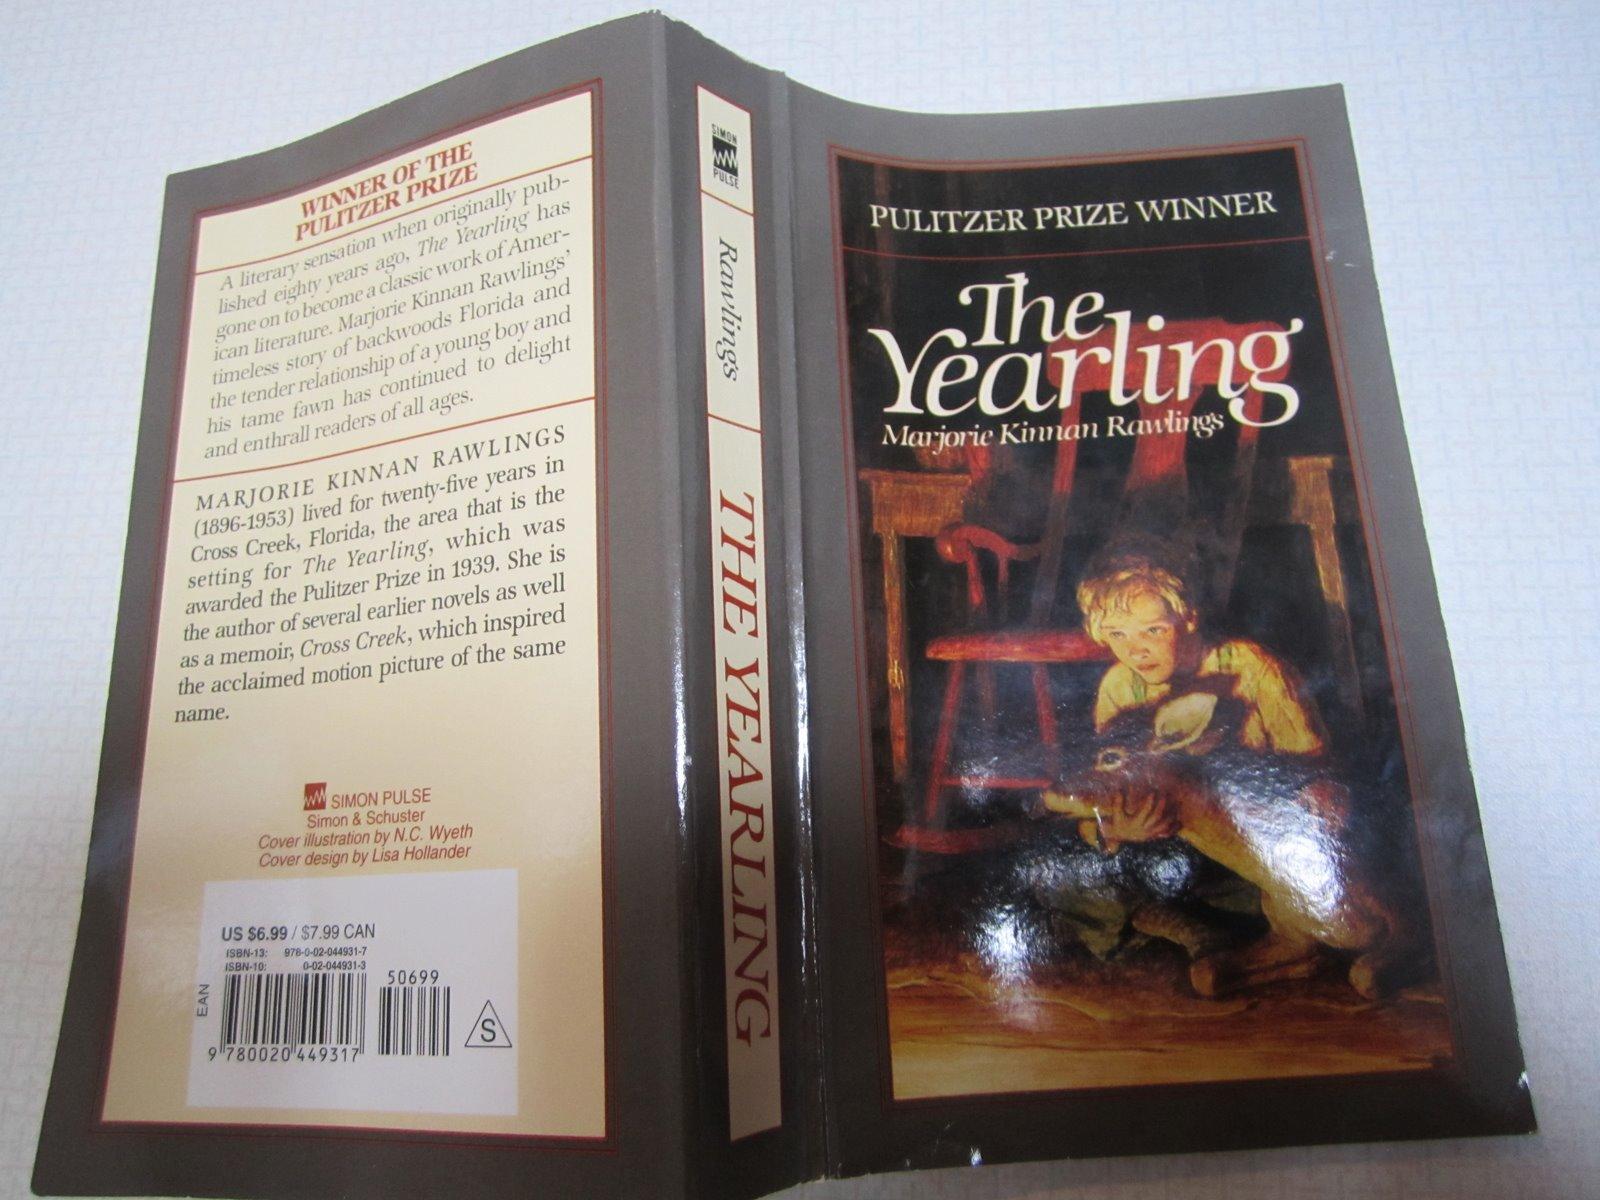 Sailing Down The Road: Marjorie Kinnan Rawlings